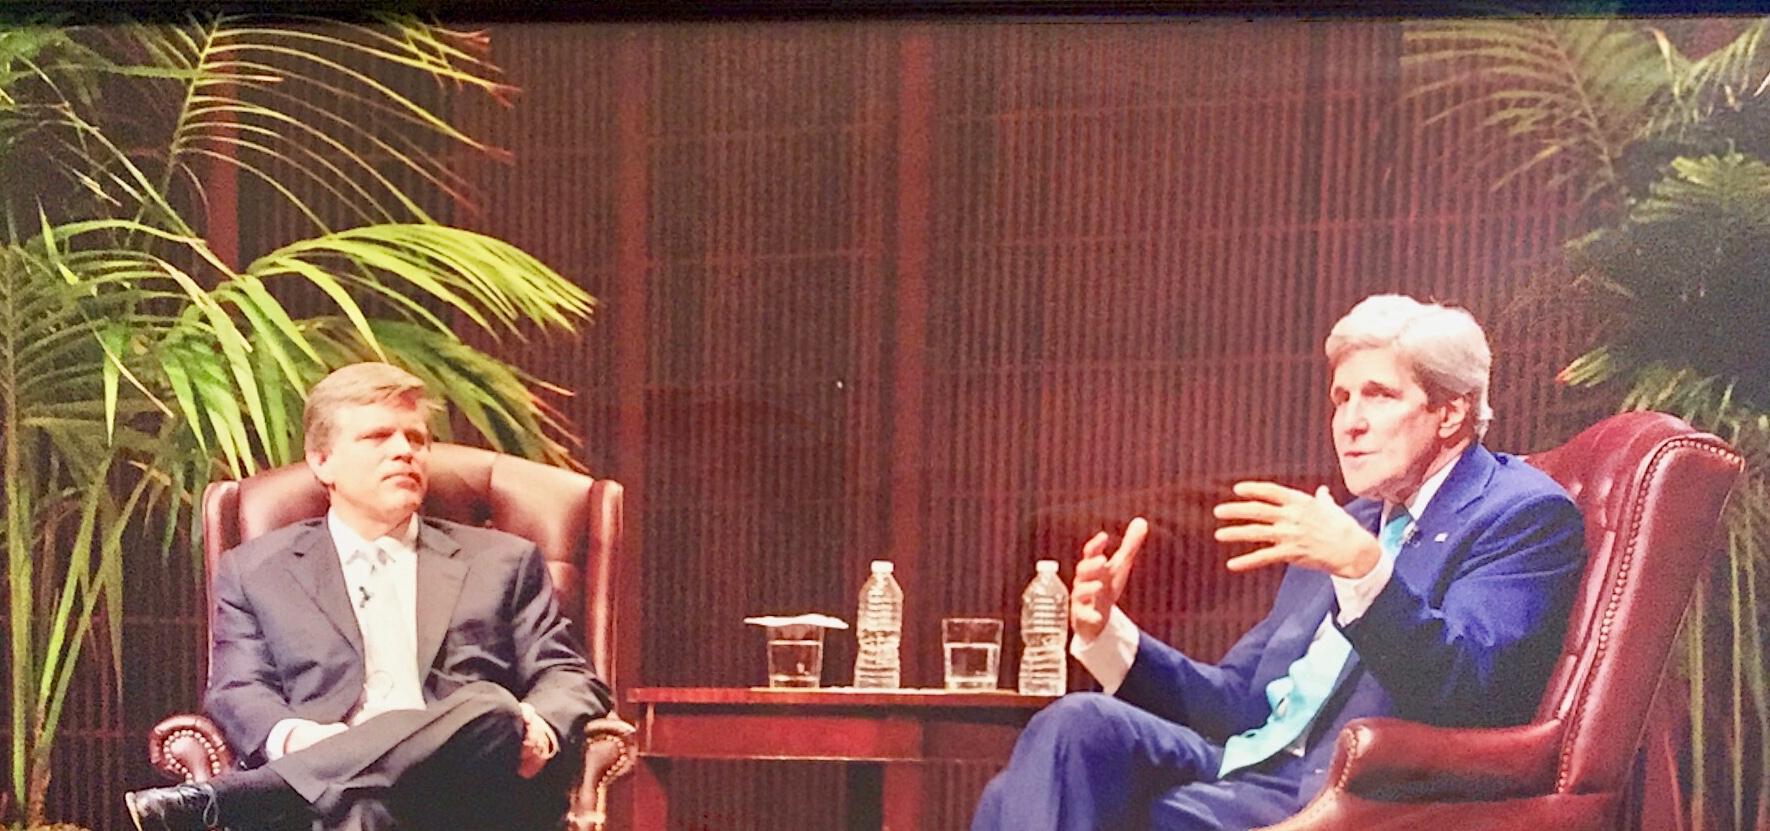 Douglas Brinkley and John Kerry